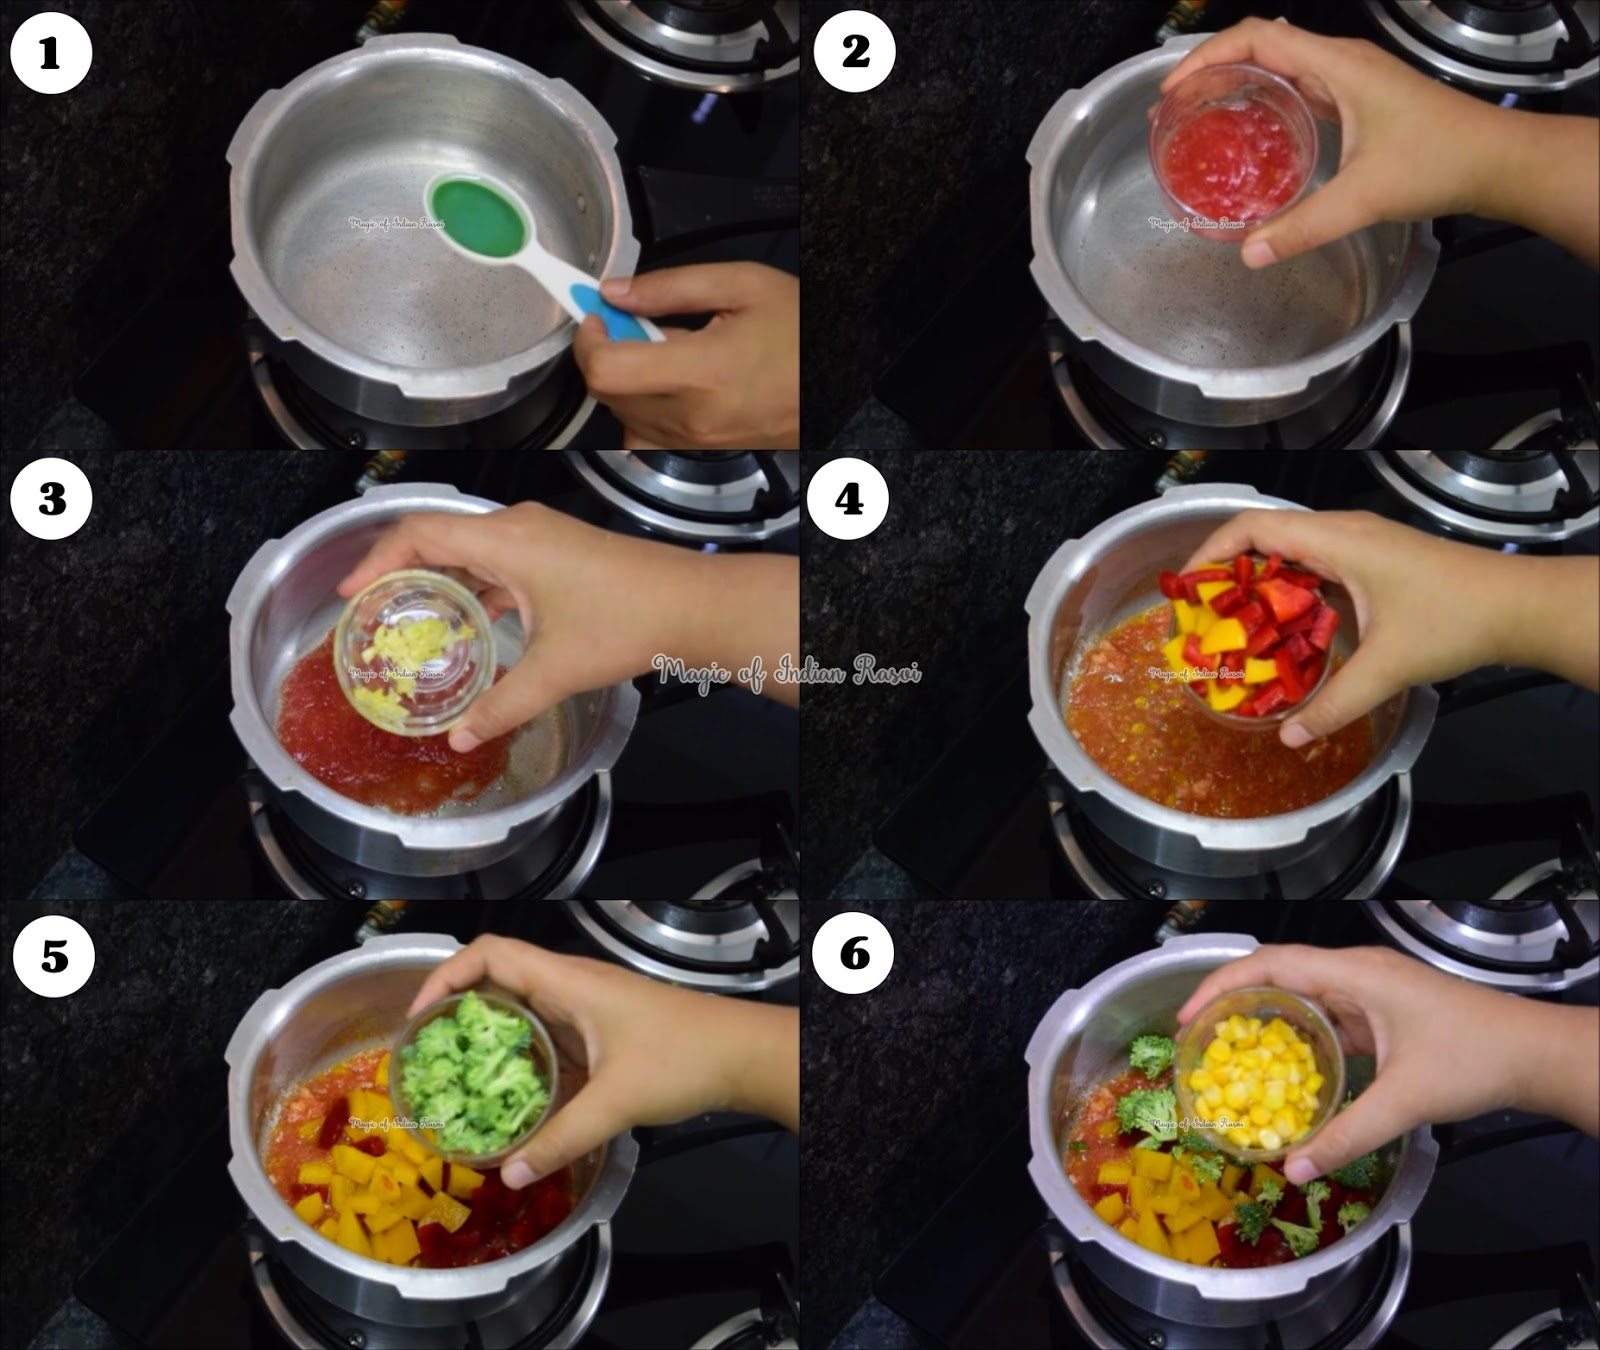 Cheesy Penne Pasta in pressure cooker - One Pot Pasta (Quick) Recipe - प्रेशर कुकर में चीज़ी पेने पास्ता - एक पॉट पास्ता (क्विक) रेसिपी - Priya R - Magic of Indian Rasoi